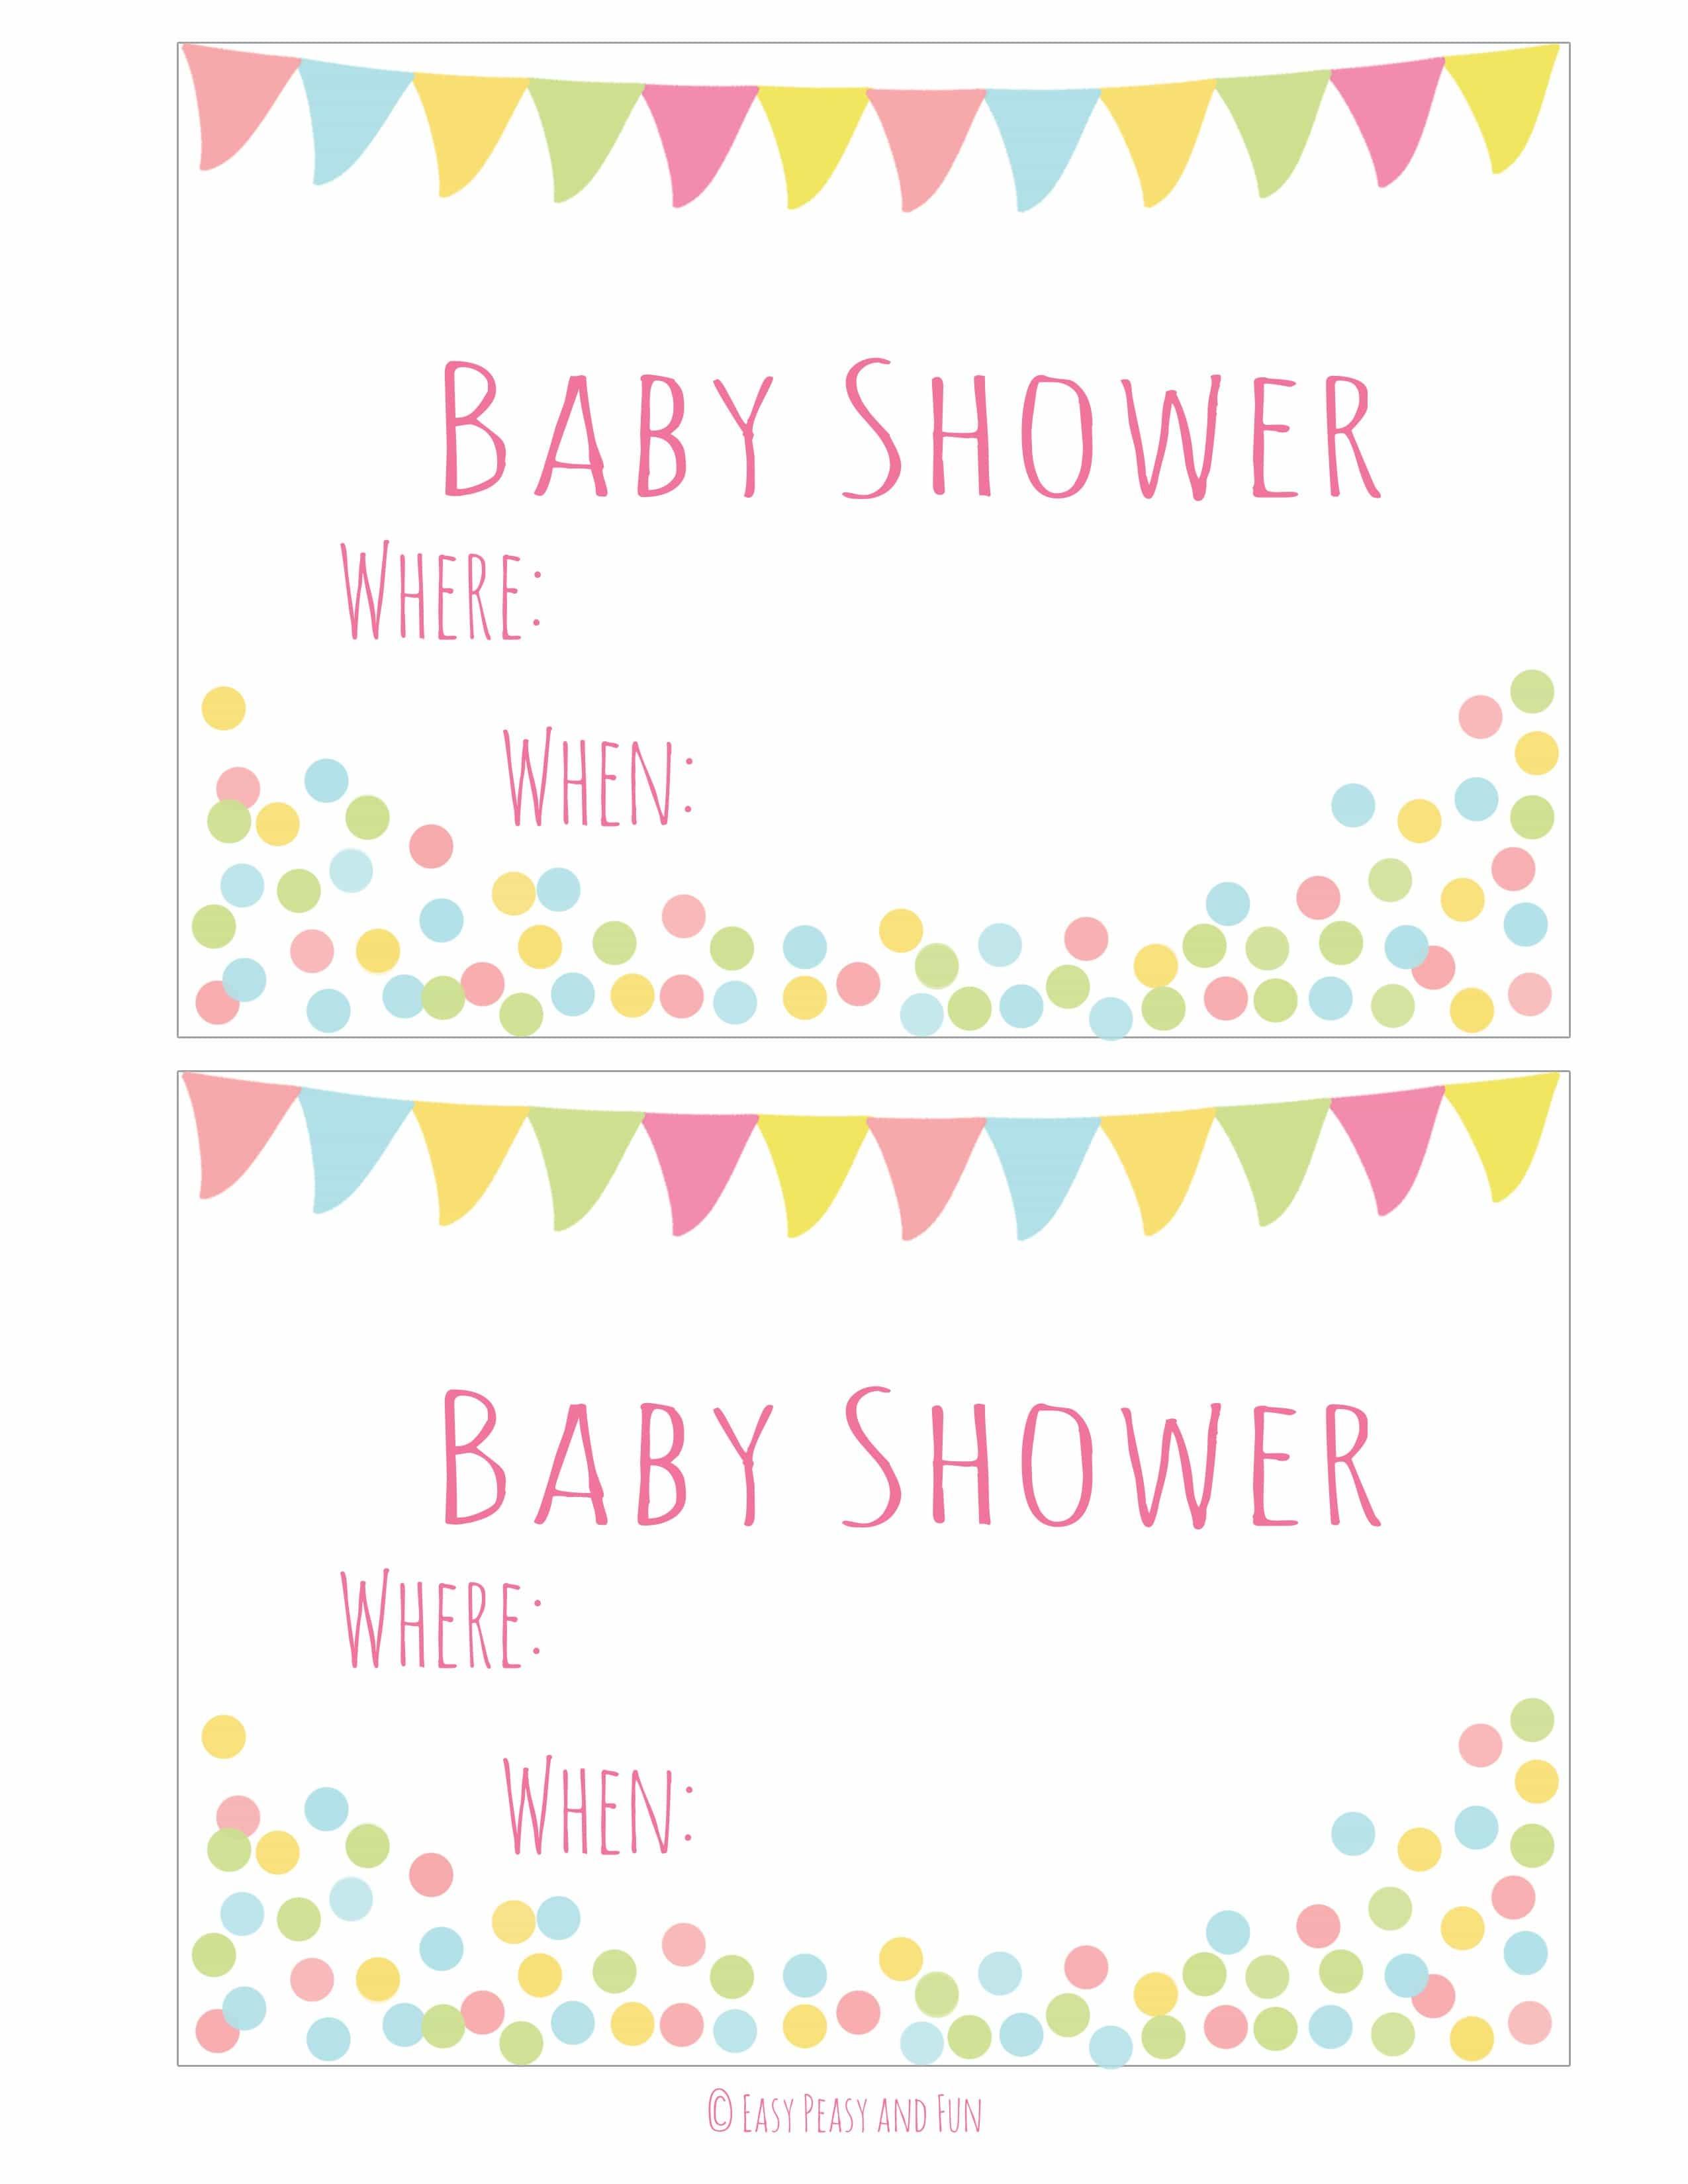 Free Printable Baby Shower Invitation - Easy Peasy And Fun - Free Printable Baby Shower Invitations